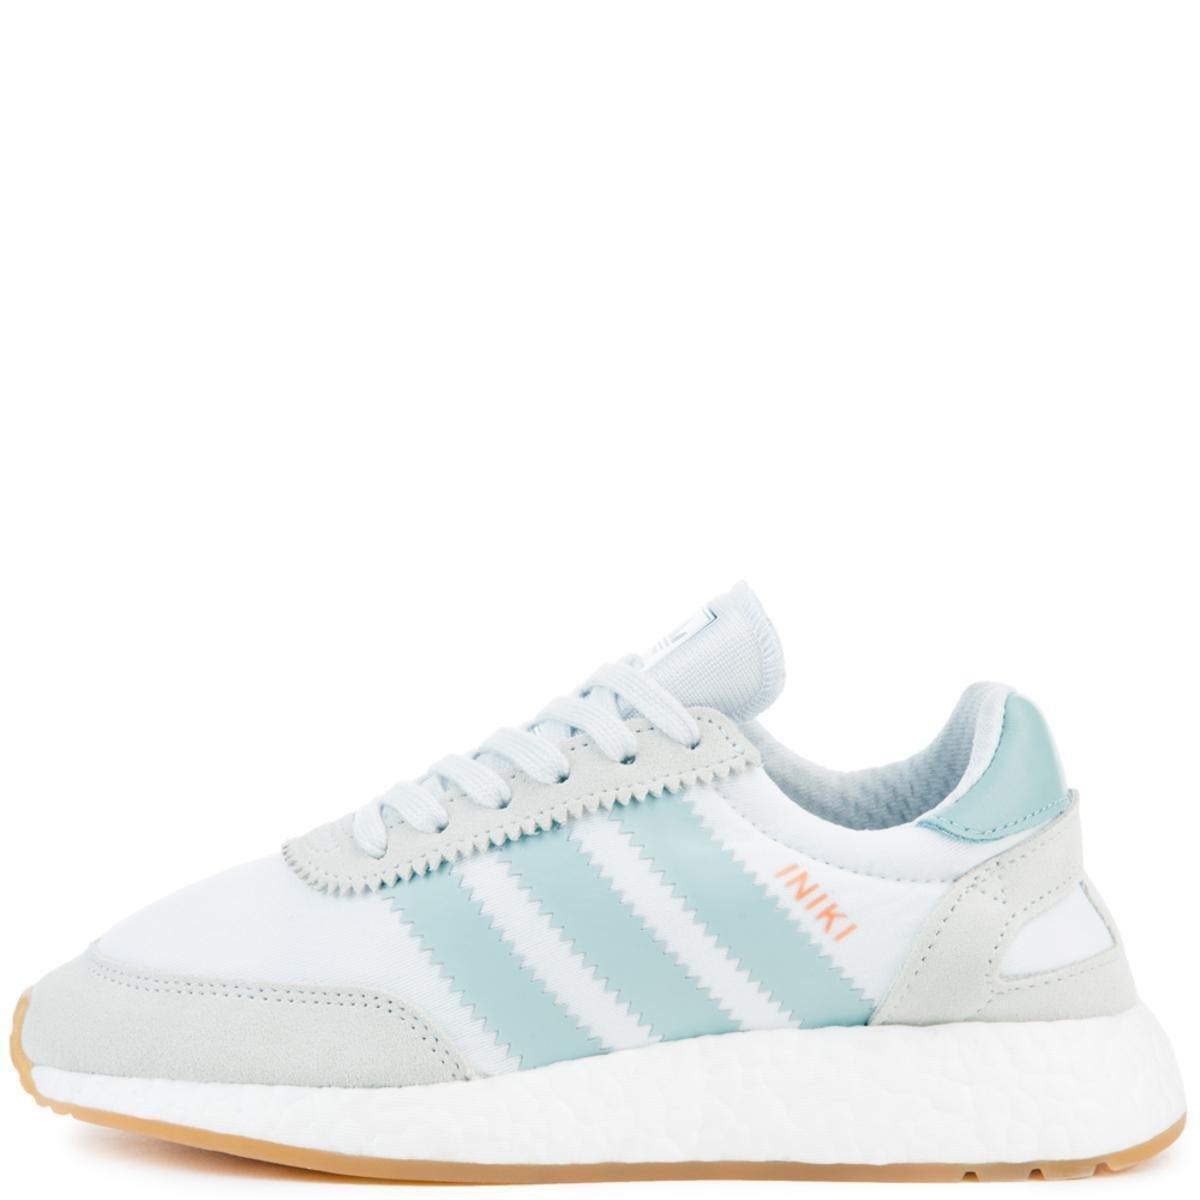 99c30246ccb35 Adidas Womens INIKI RUNNER W WHT/TACGRN/GUM3 LACE UP 10